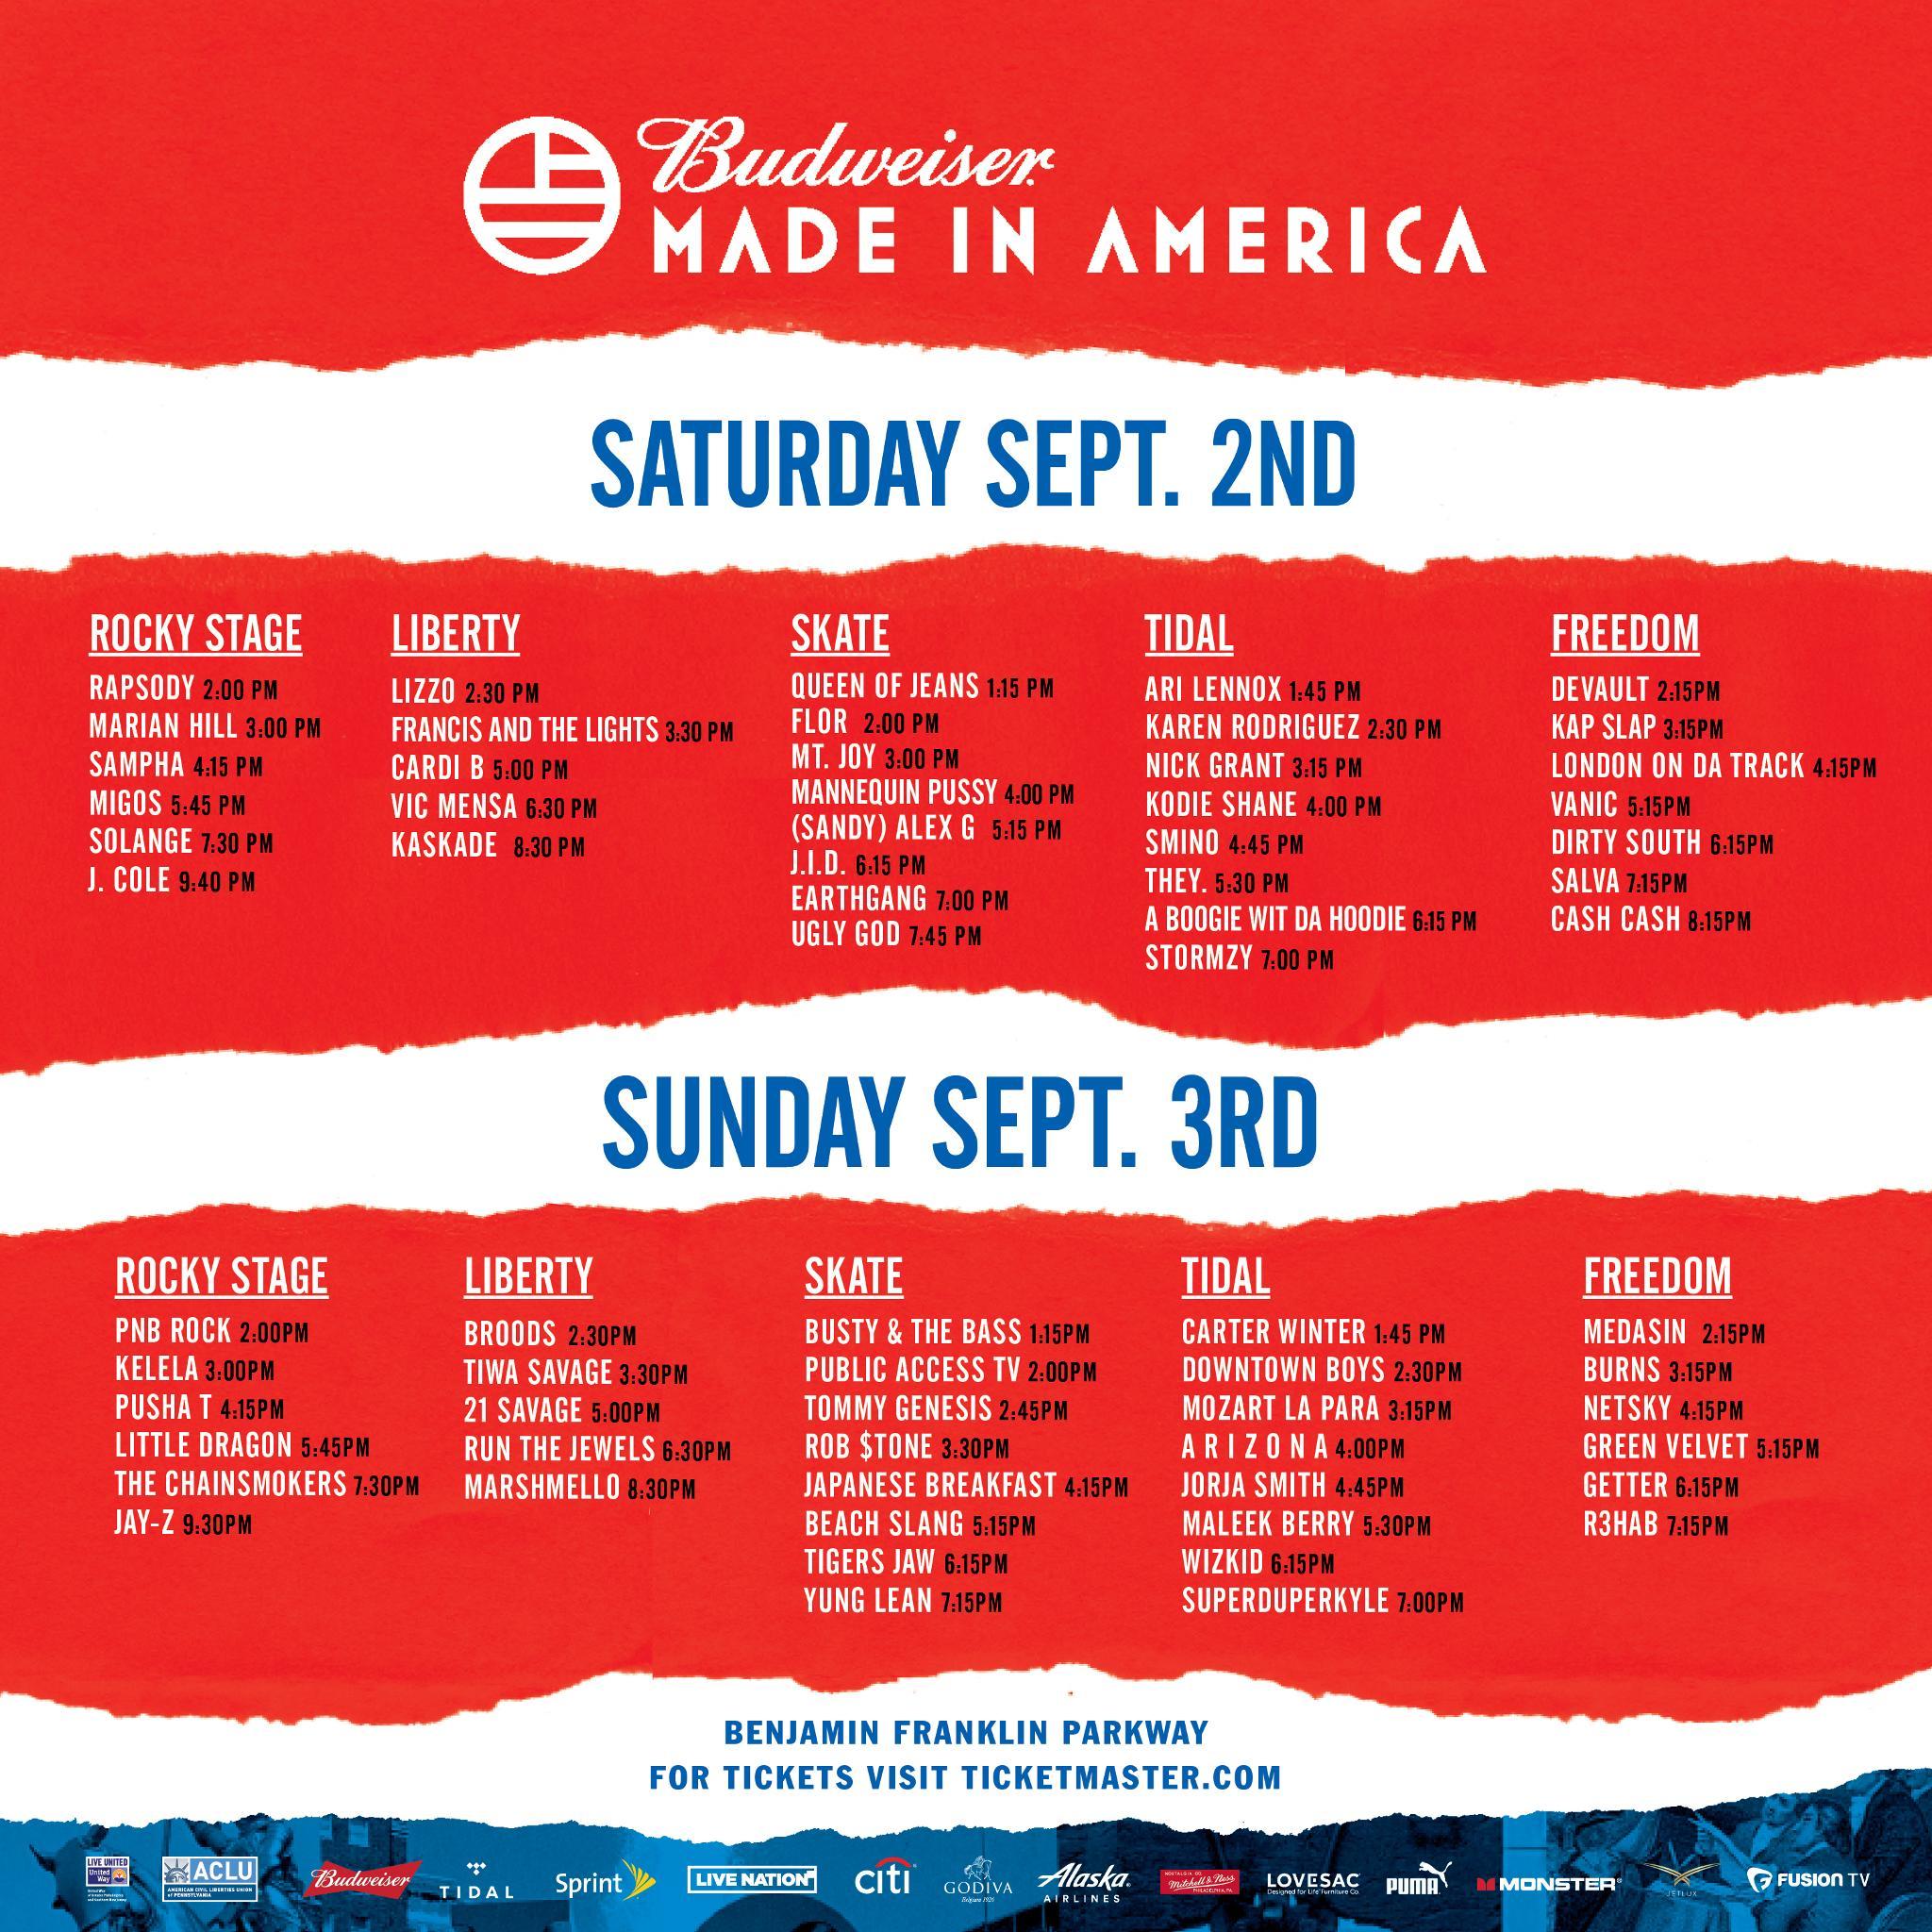 The Made in America schedule.